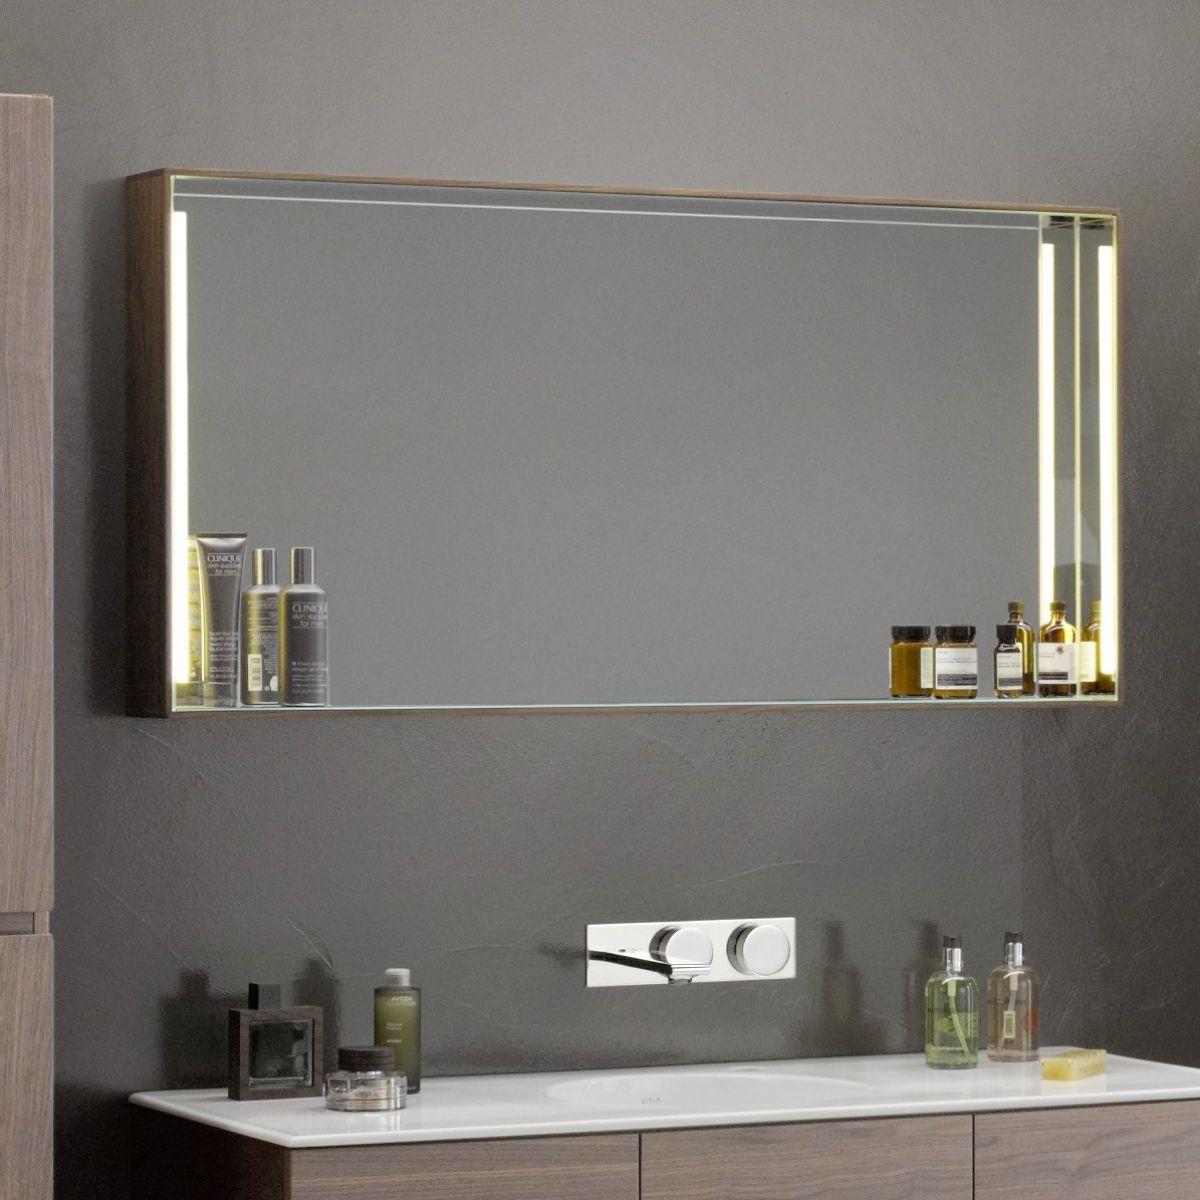 Vitra Memoria Illuminated Mirror With Shelf Bathroom Mirror With Shelf Mirror With Shelf Illuminated Mirrors